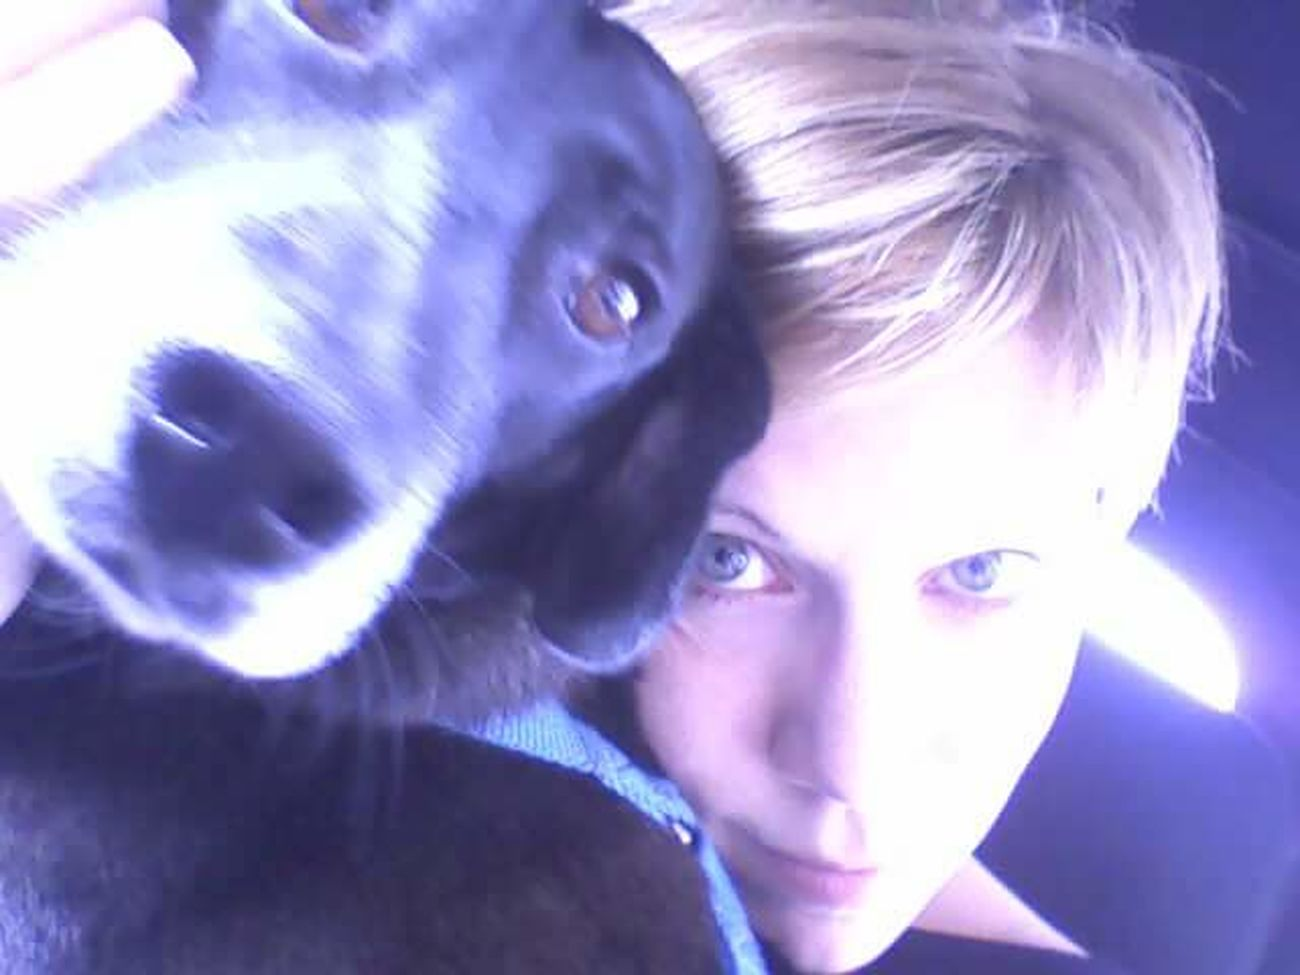 Dog❤ Dog Love Dogs Of EyeEm Dog Photography Dogselfie I And My Dog Dog Dogs Selfshot Selfshooting